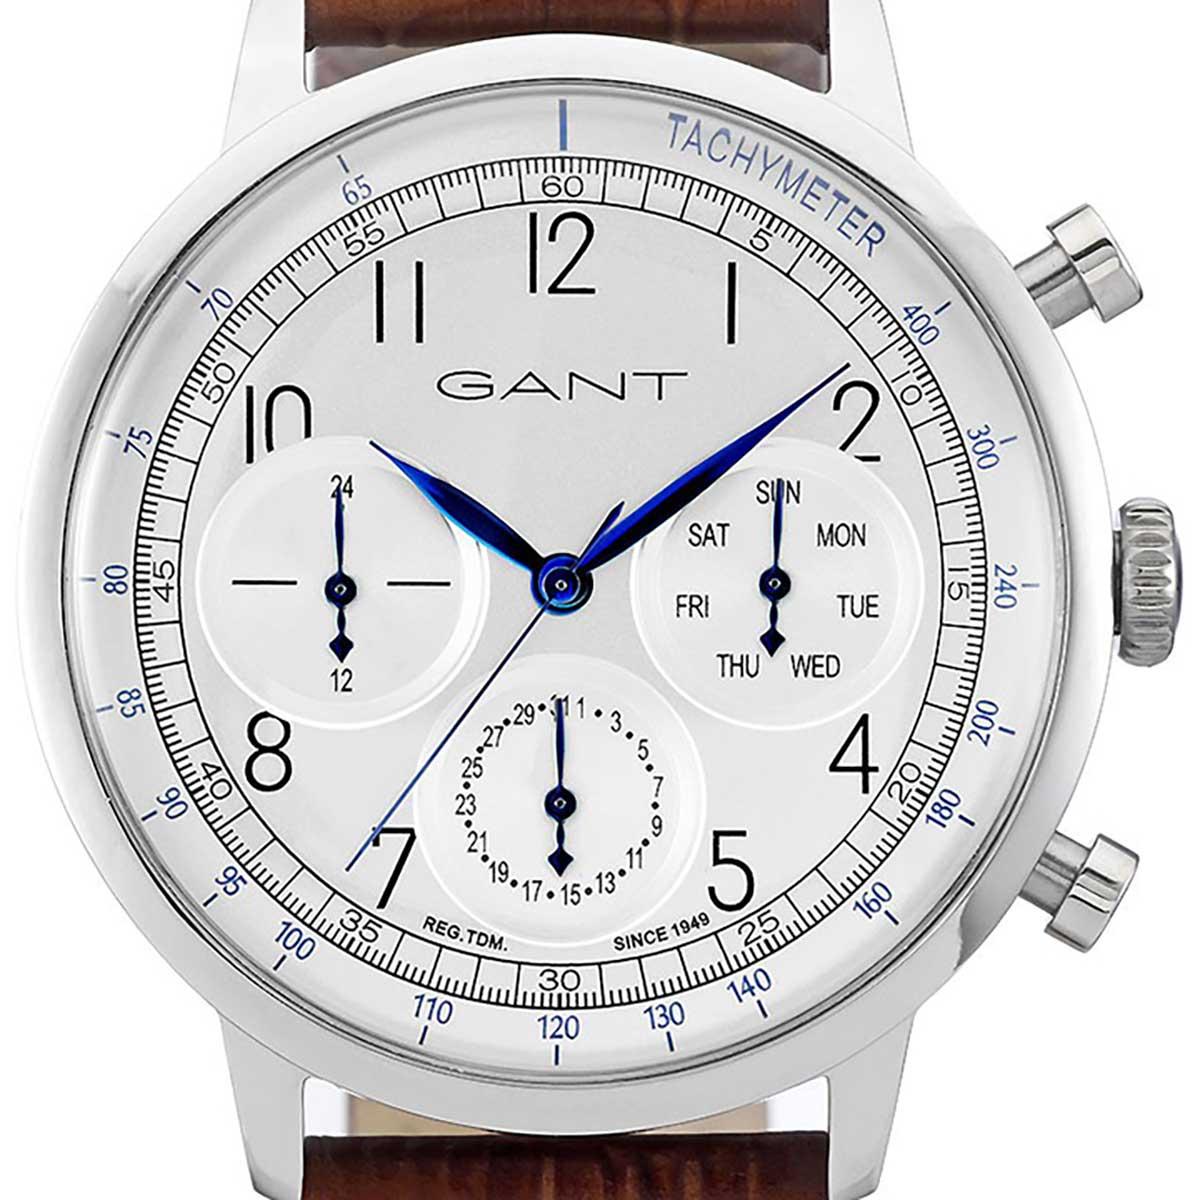 GANT ガント 電池式クォーツ 腕時計 [W71202] 並行輸入品 デイデイト